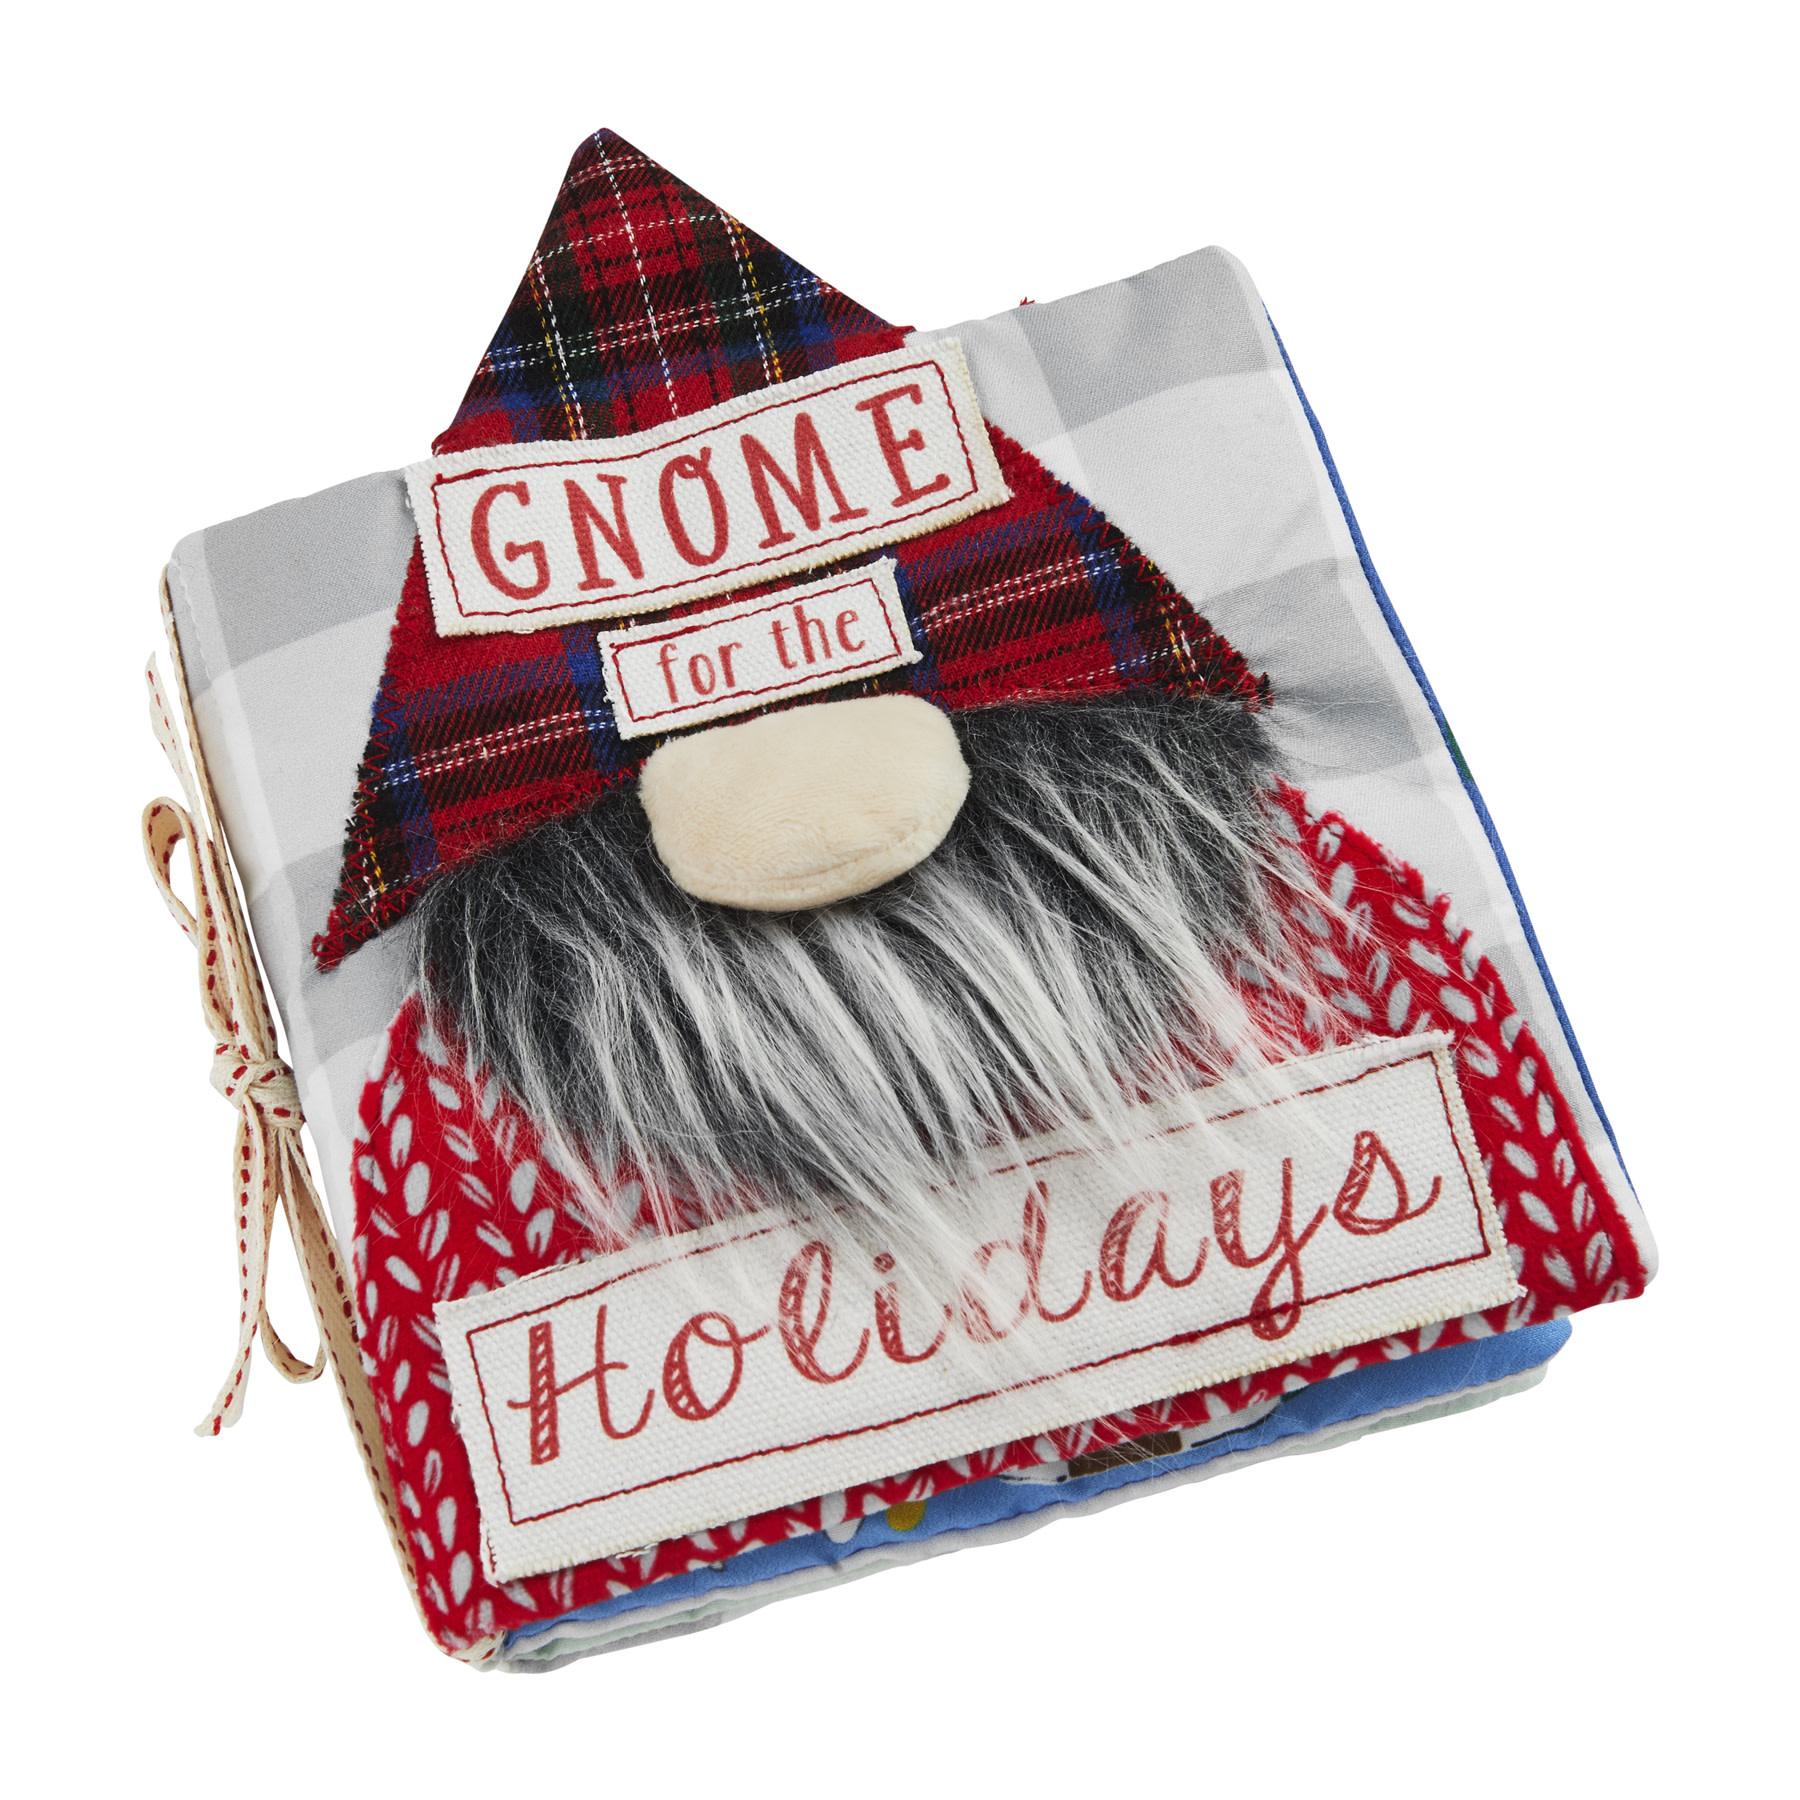 Mud Pie Gnome For Holidays Book